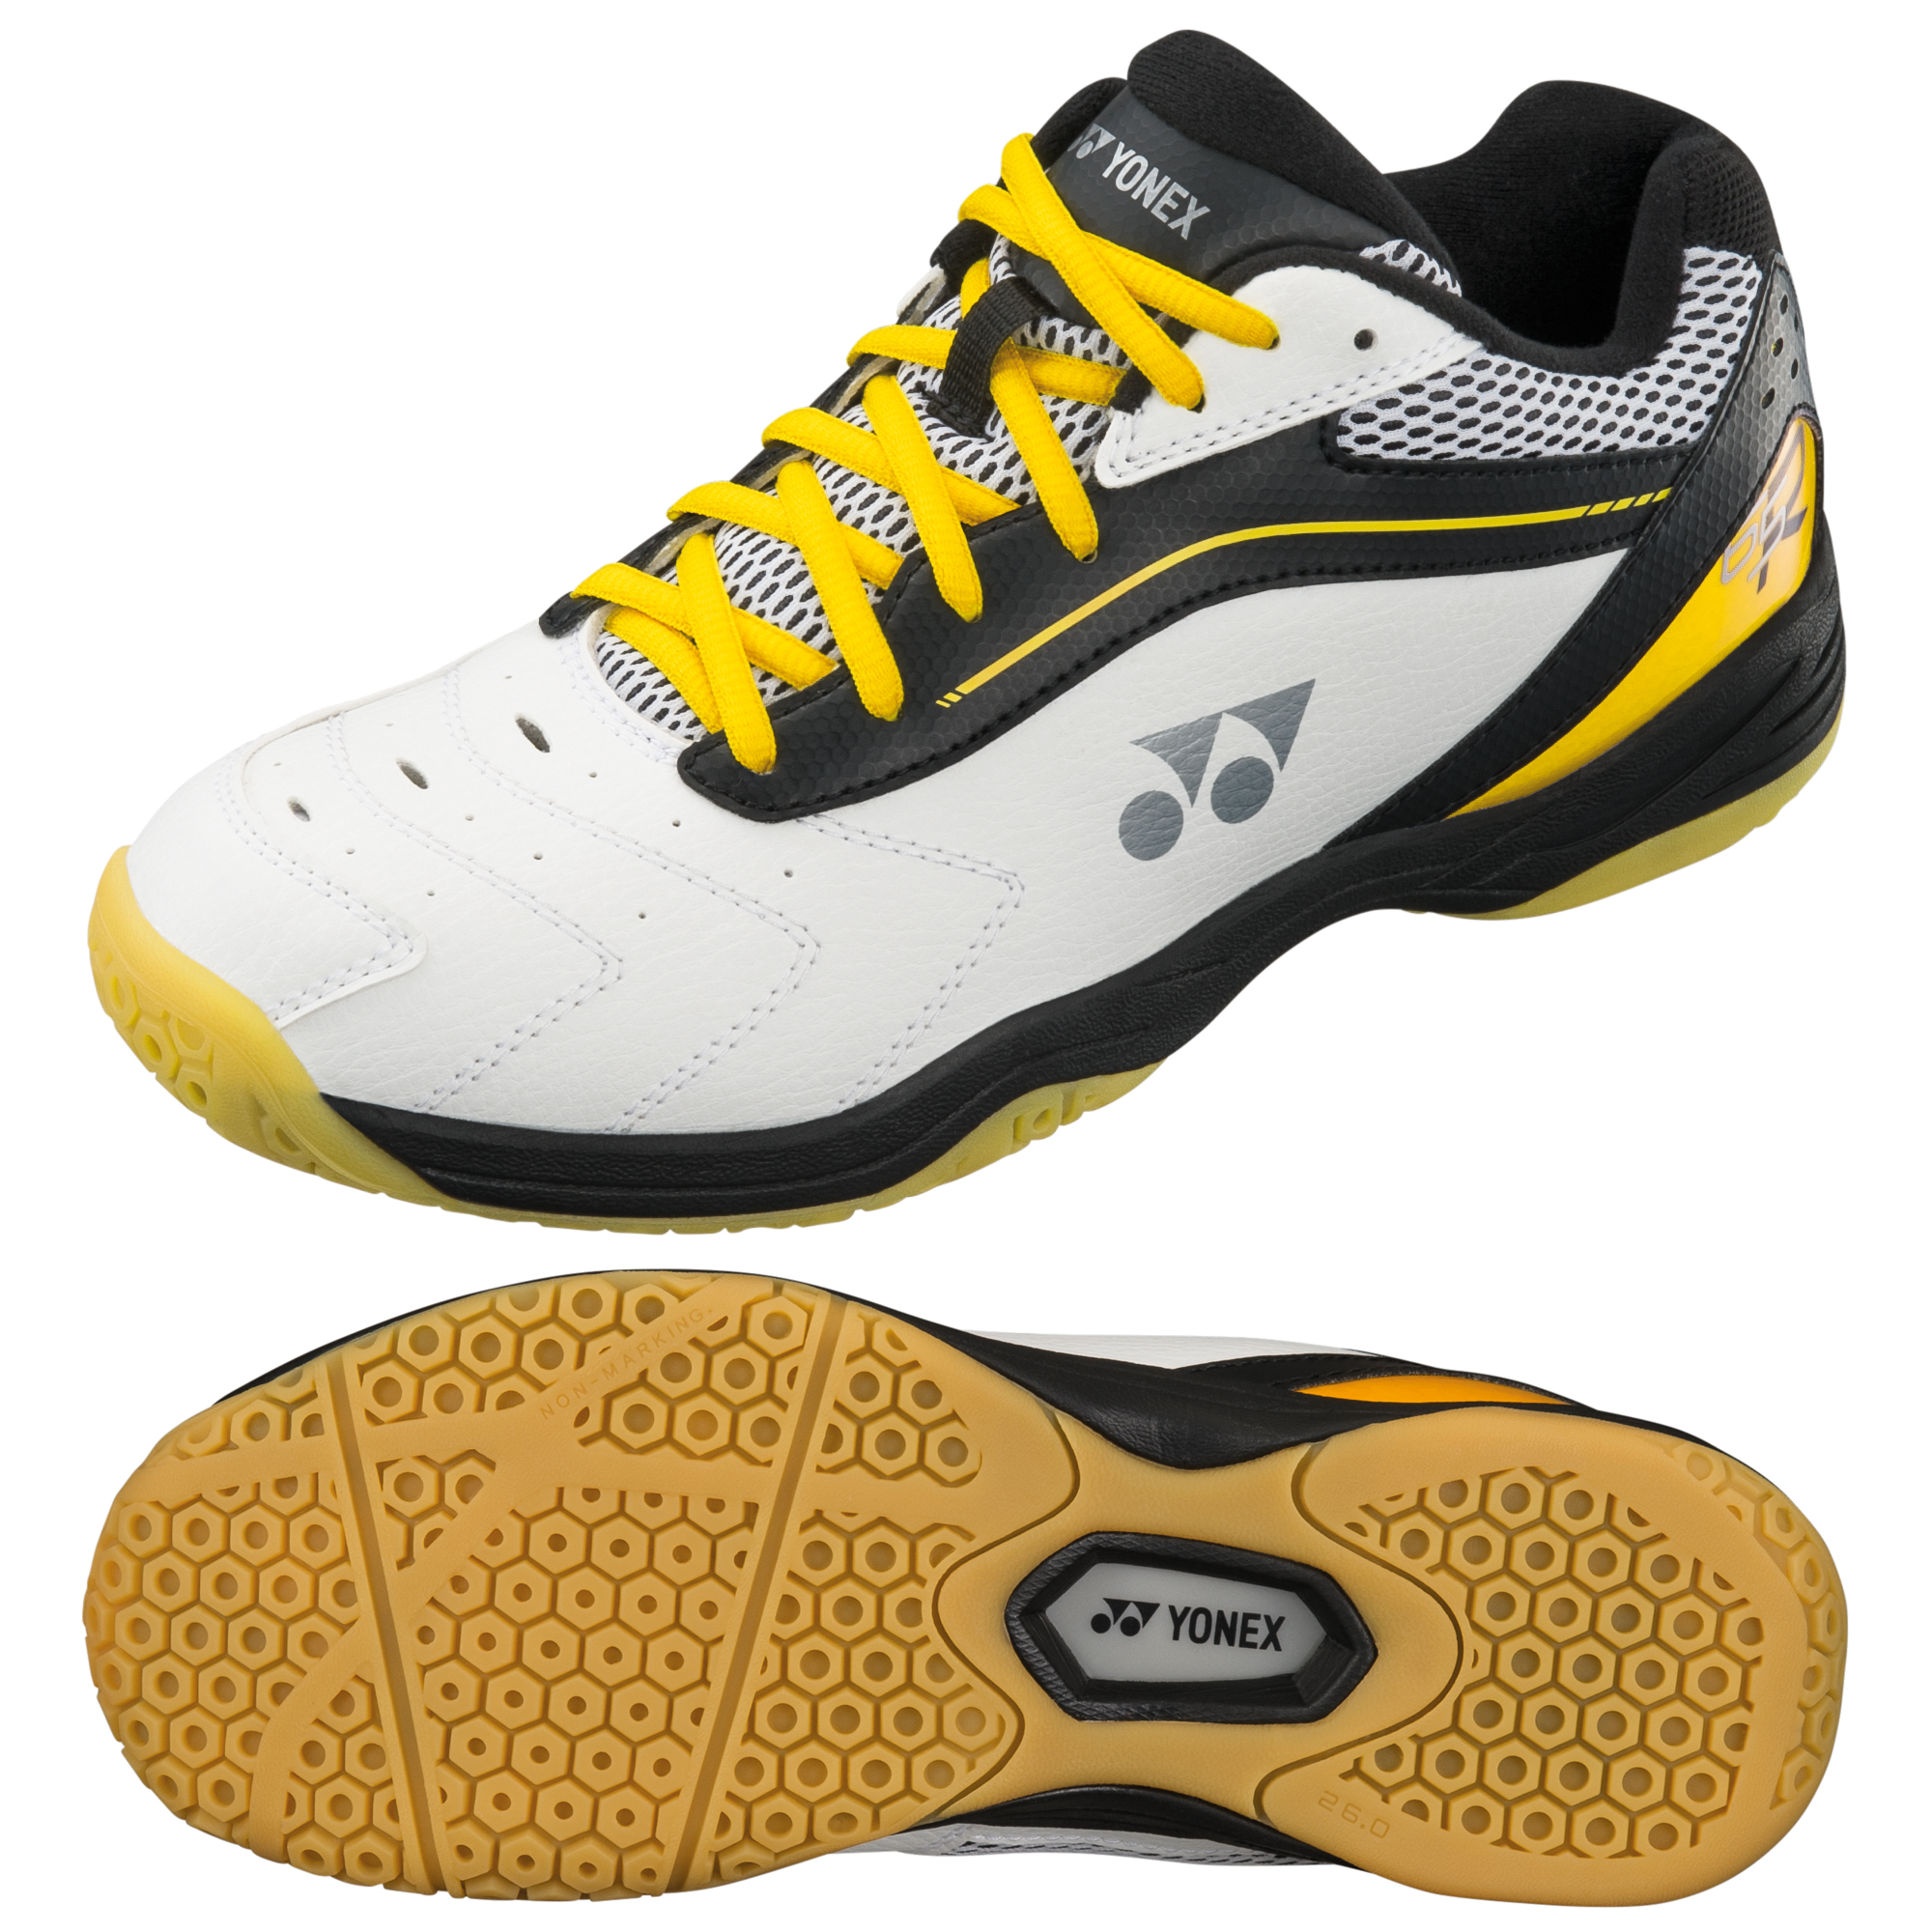 Yonex Power Cushion 65R Mens Badminton Shoes  10 UK